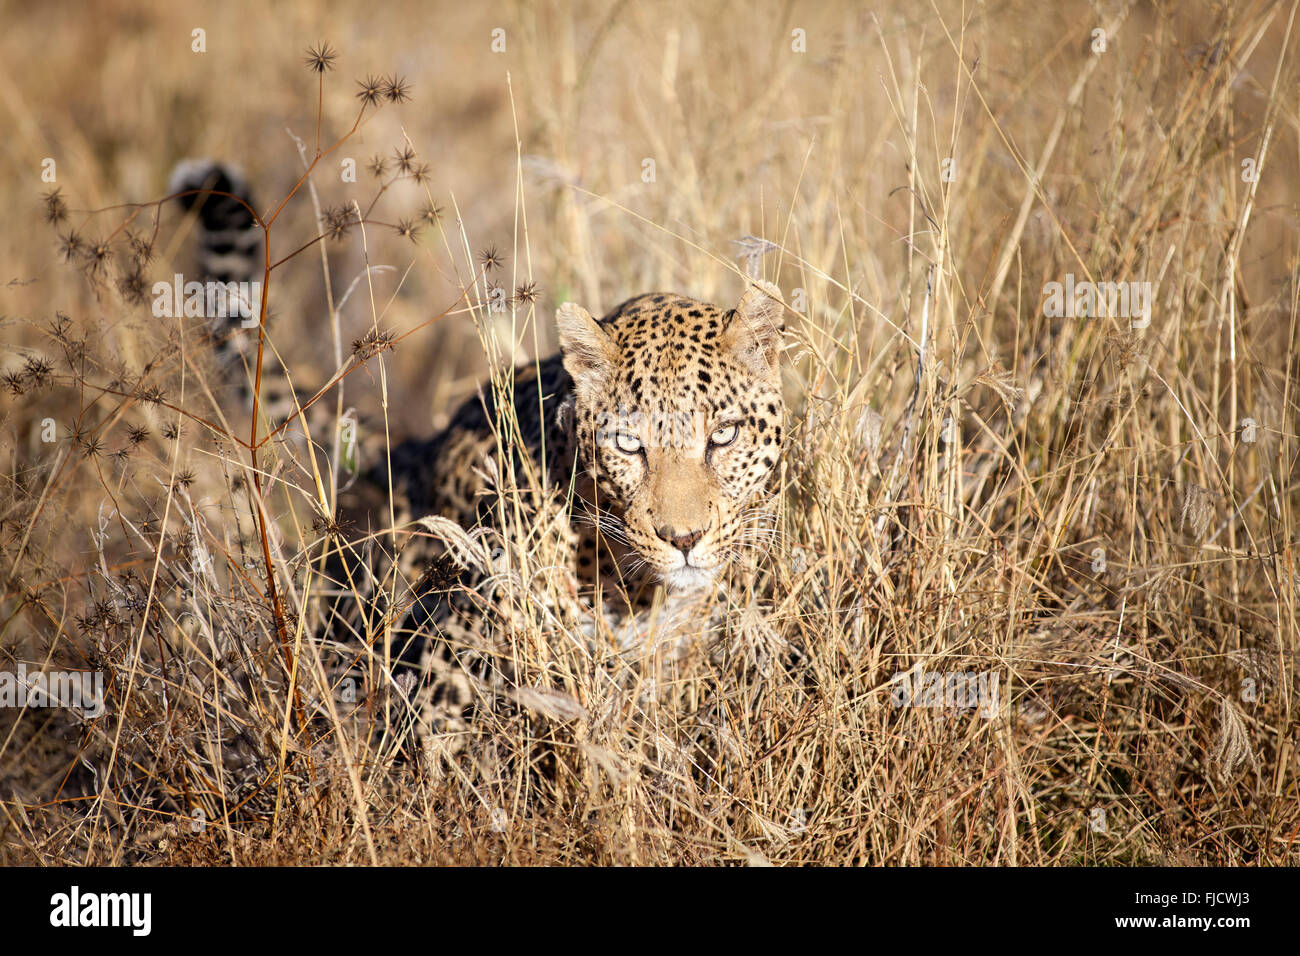 A leopard hunts in the Bushveld - Stock Image